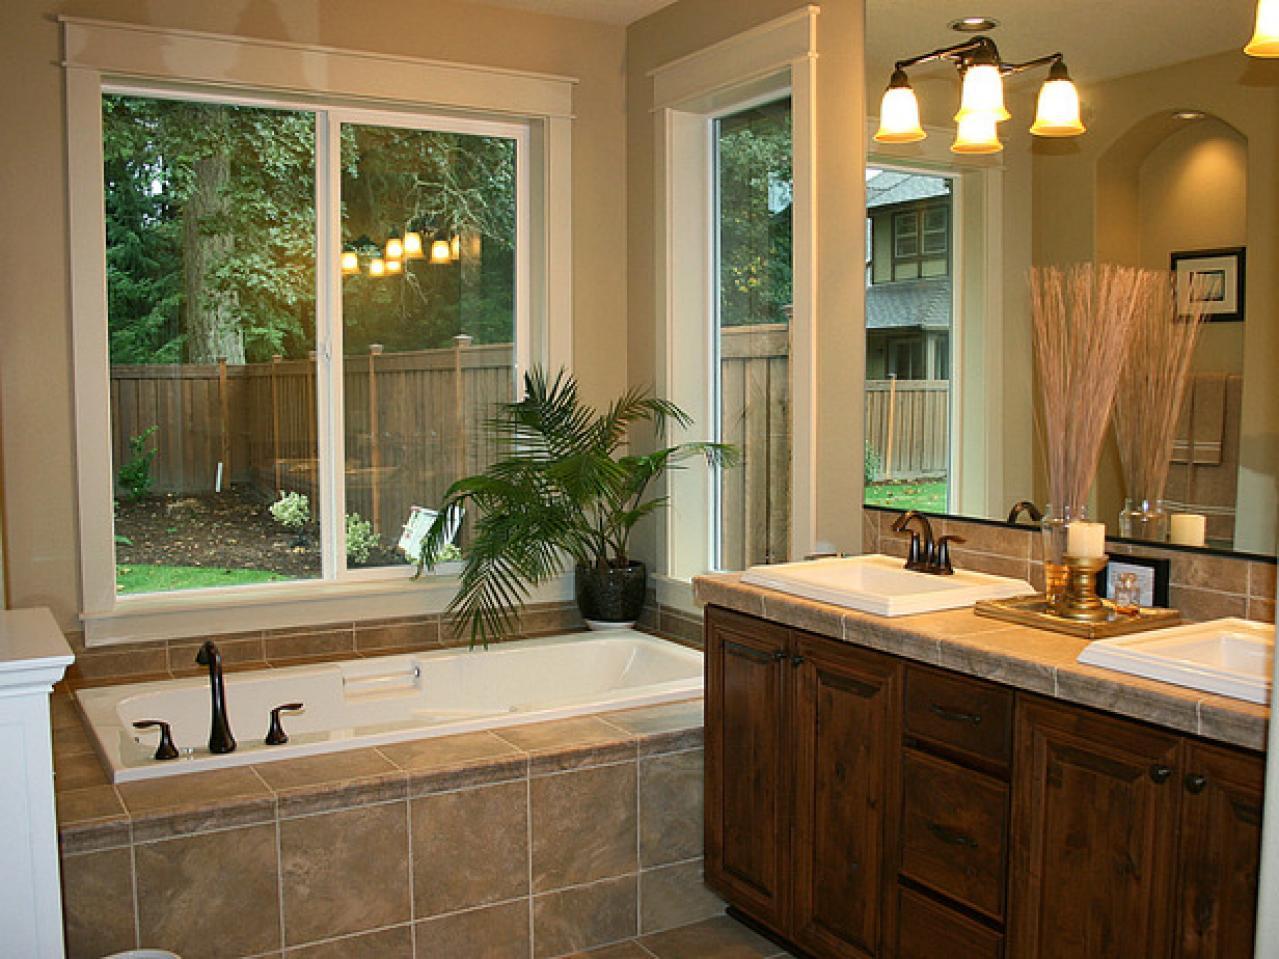 transform your ordinary bathroom to a luxury bathroom with a